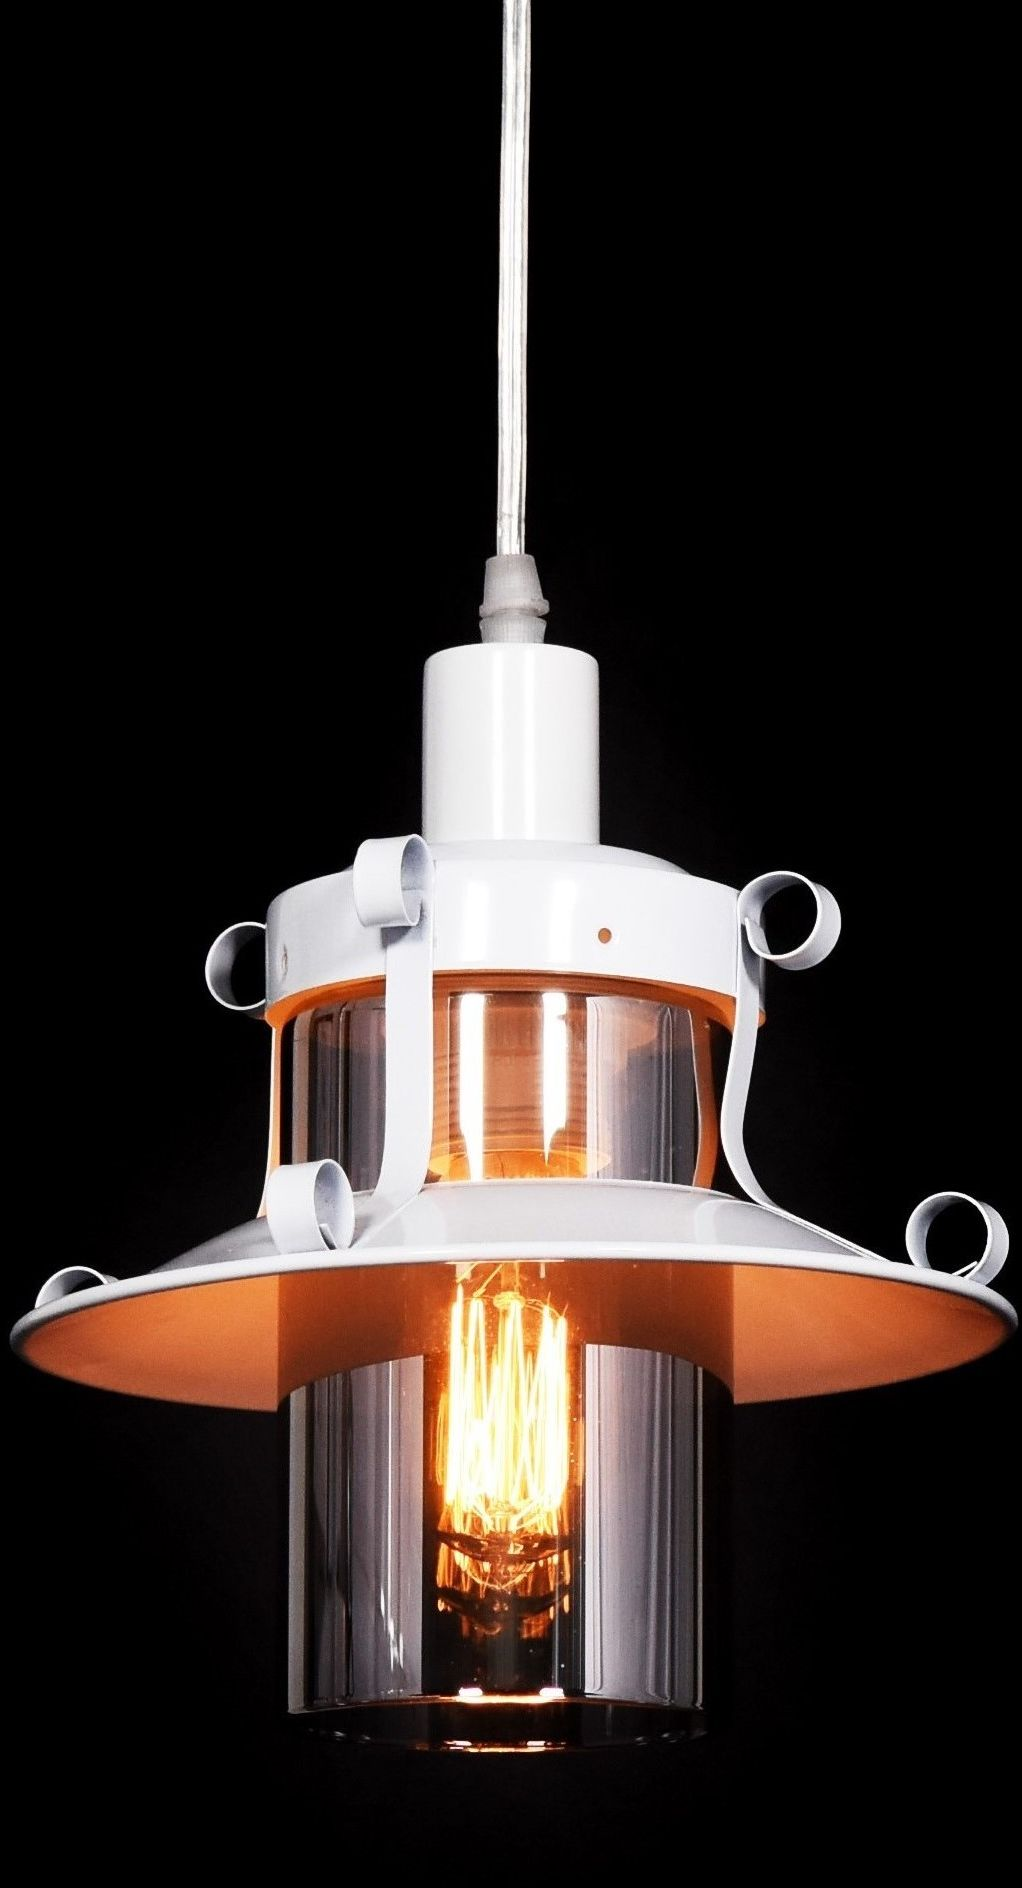 LAMPA WISZĄCA INDUSTRIALNA LOFT BIAŁA CAPRI W1